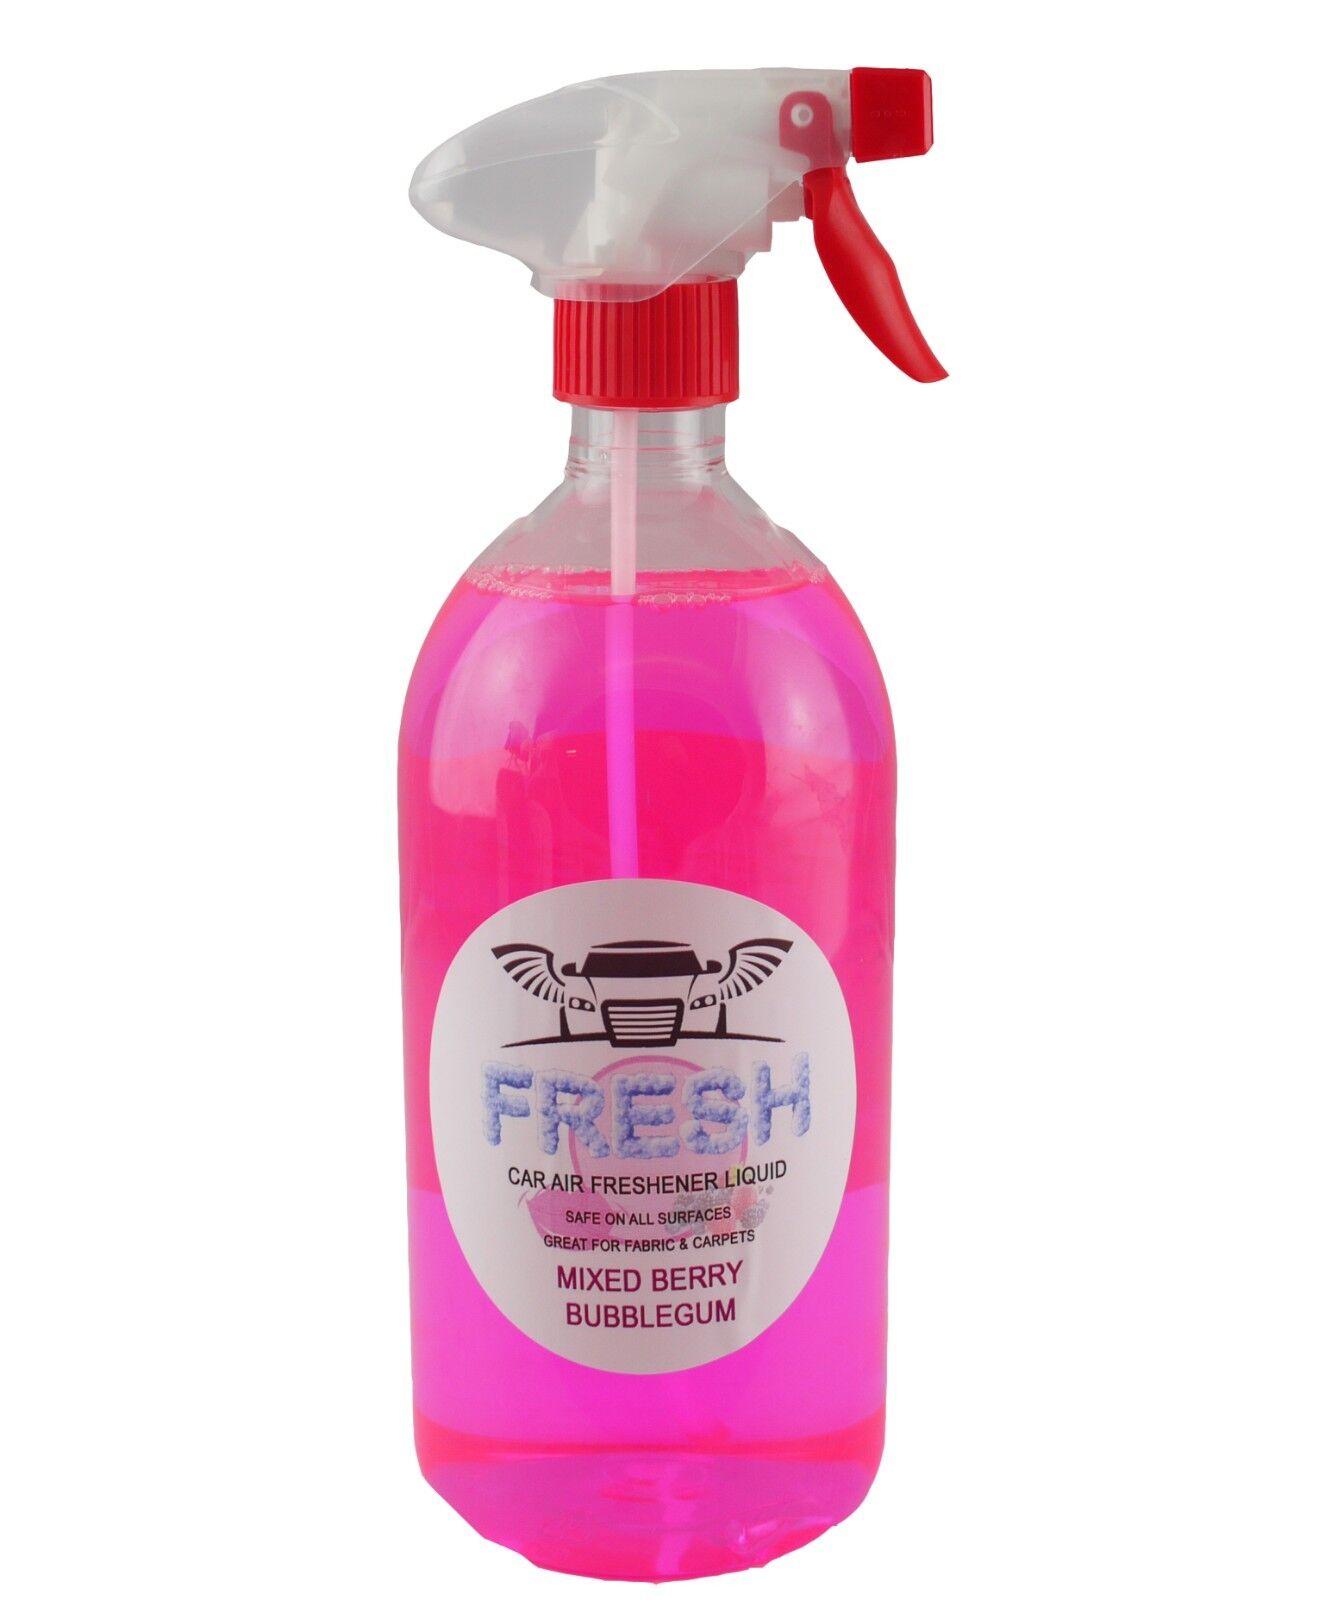 Bubblegum car air freshener ac units for sale near me